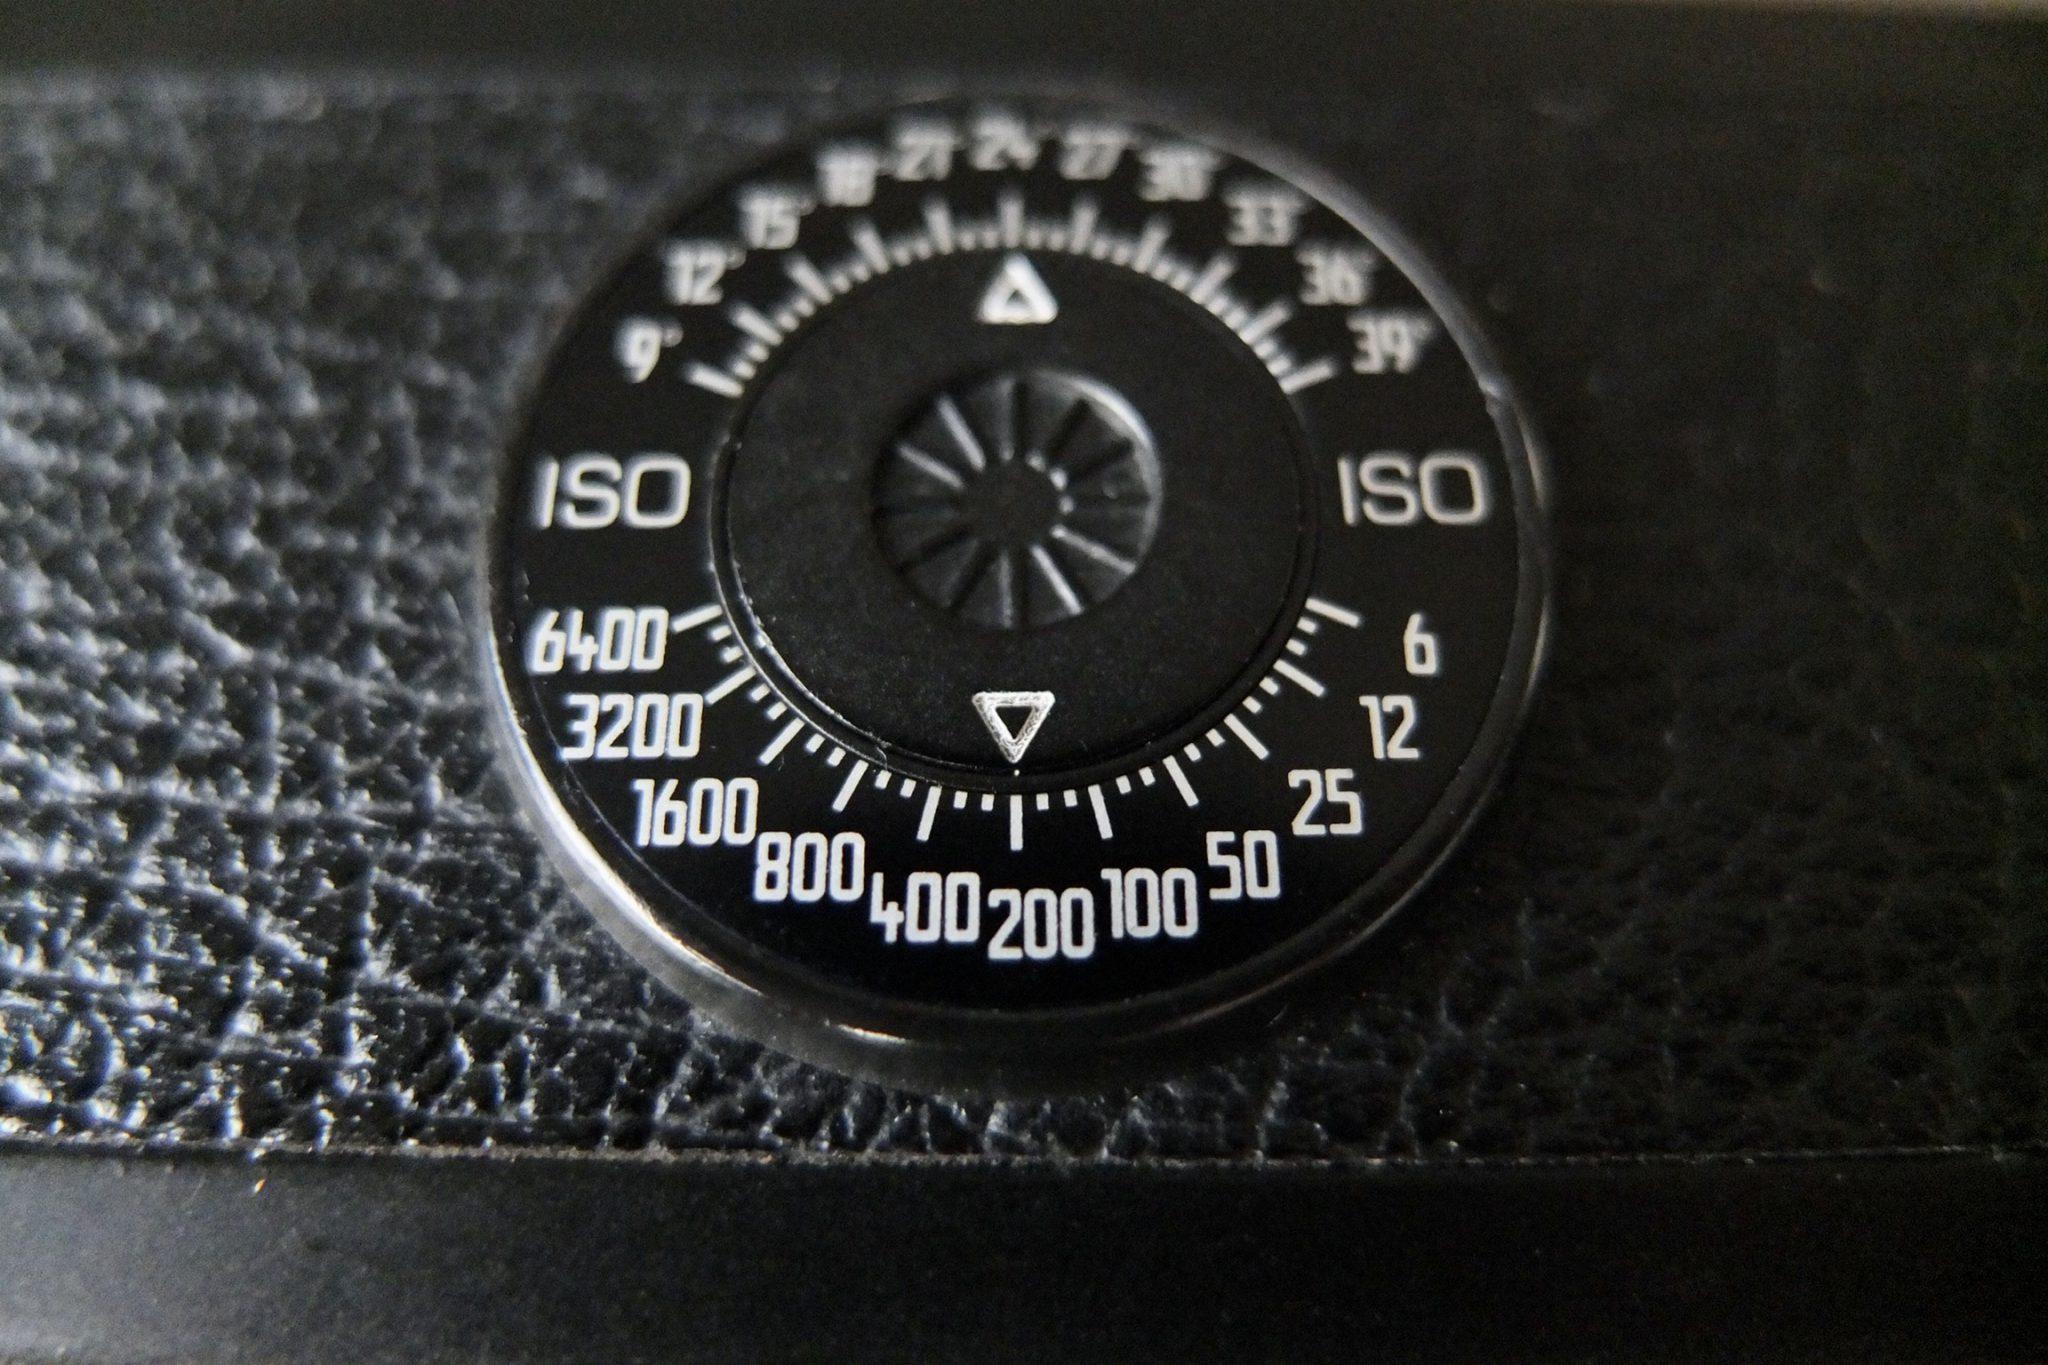 Leica M6 ISO